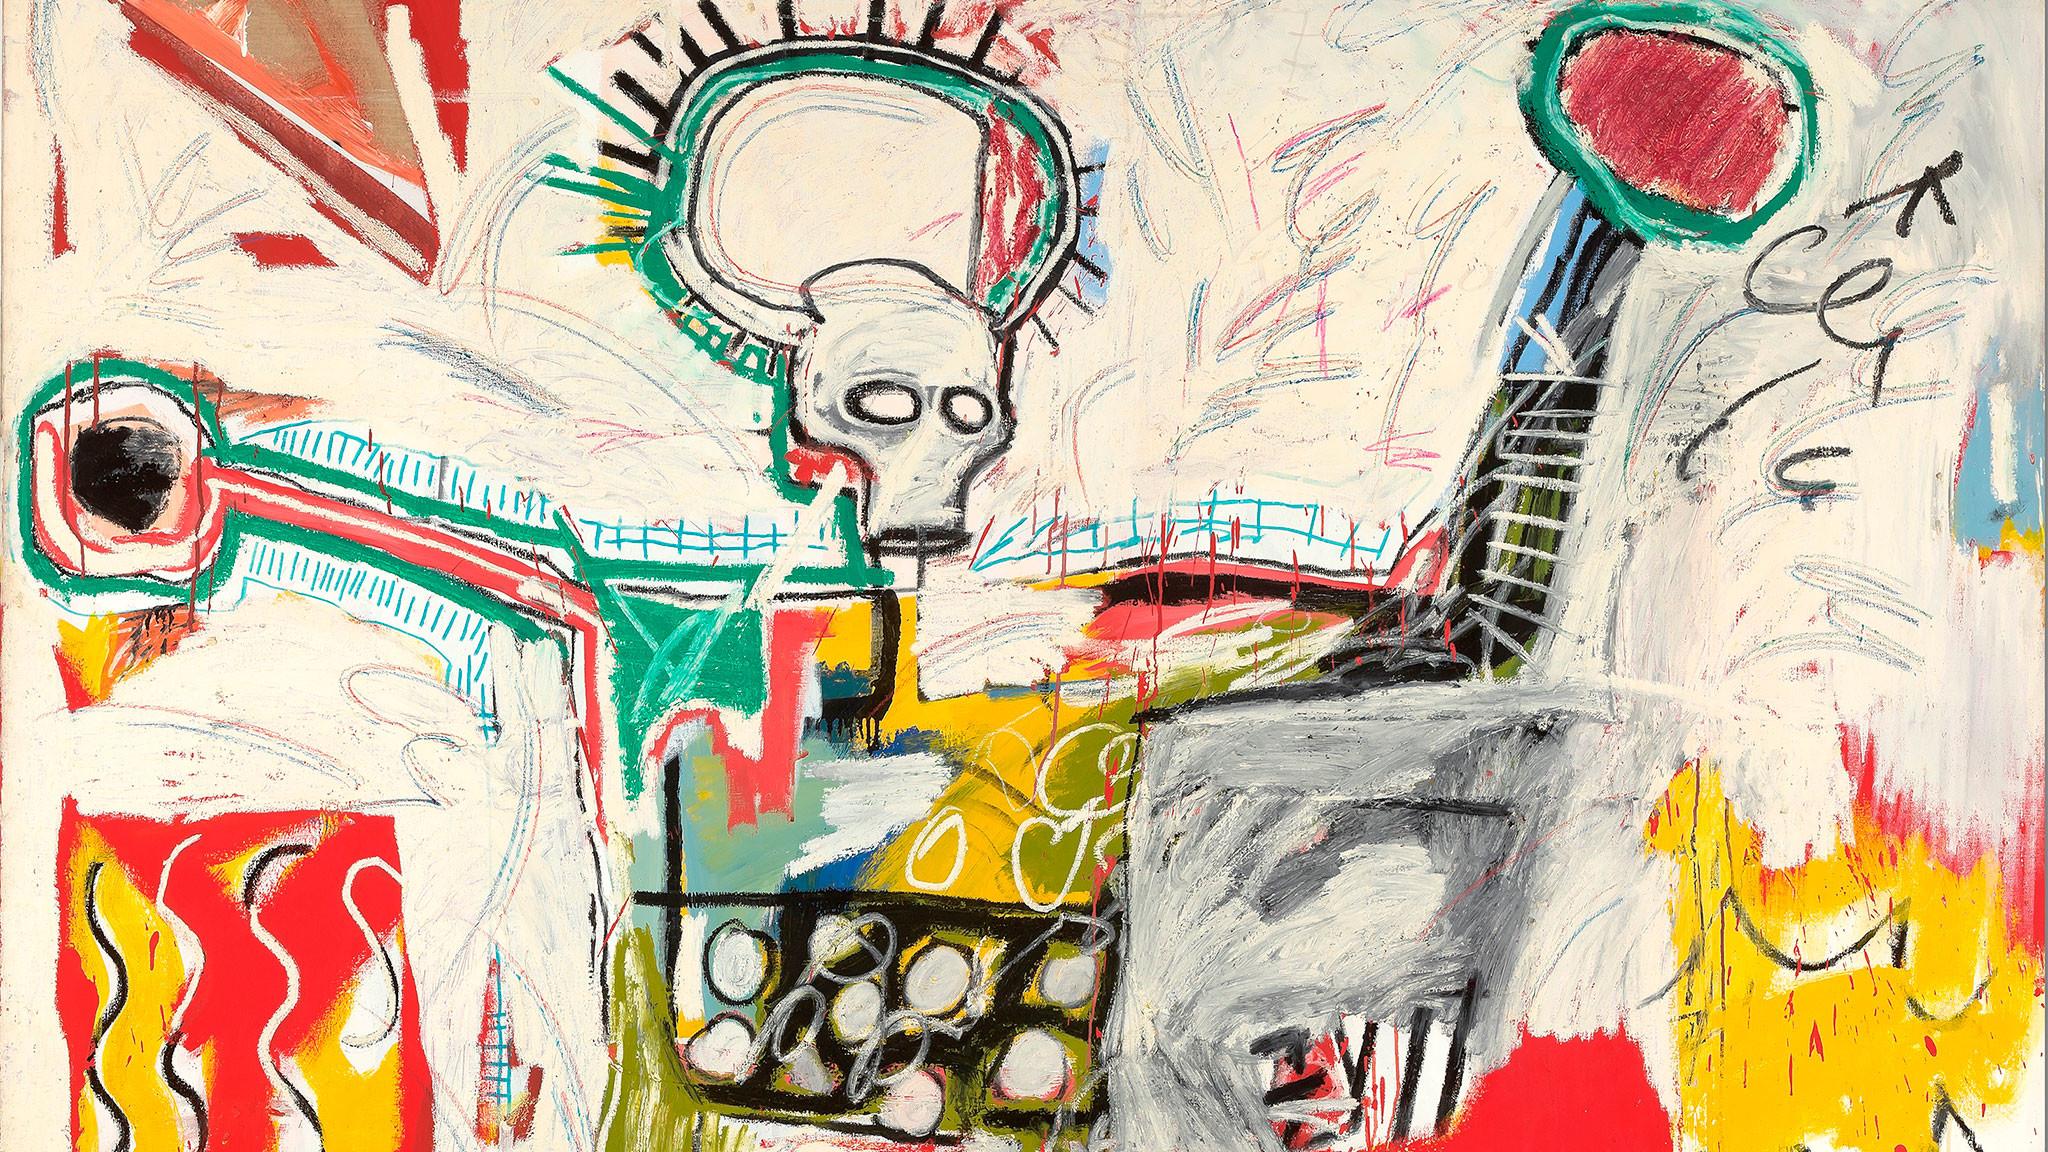 basquiat wallpaper 51 images